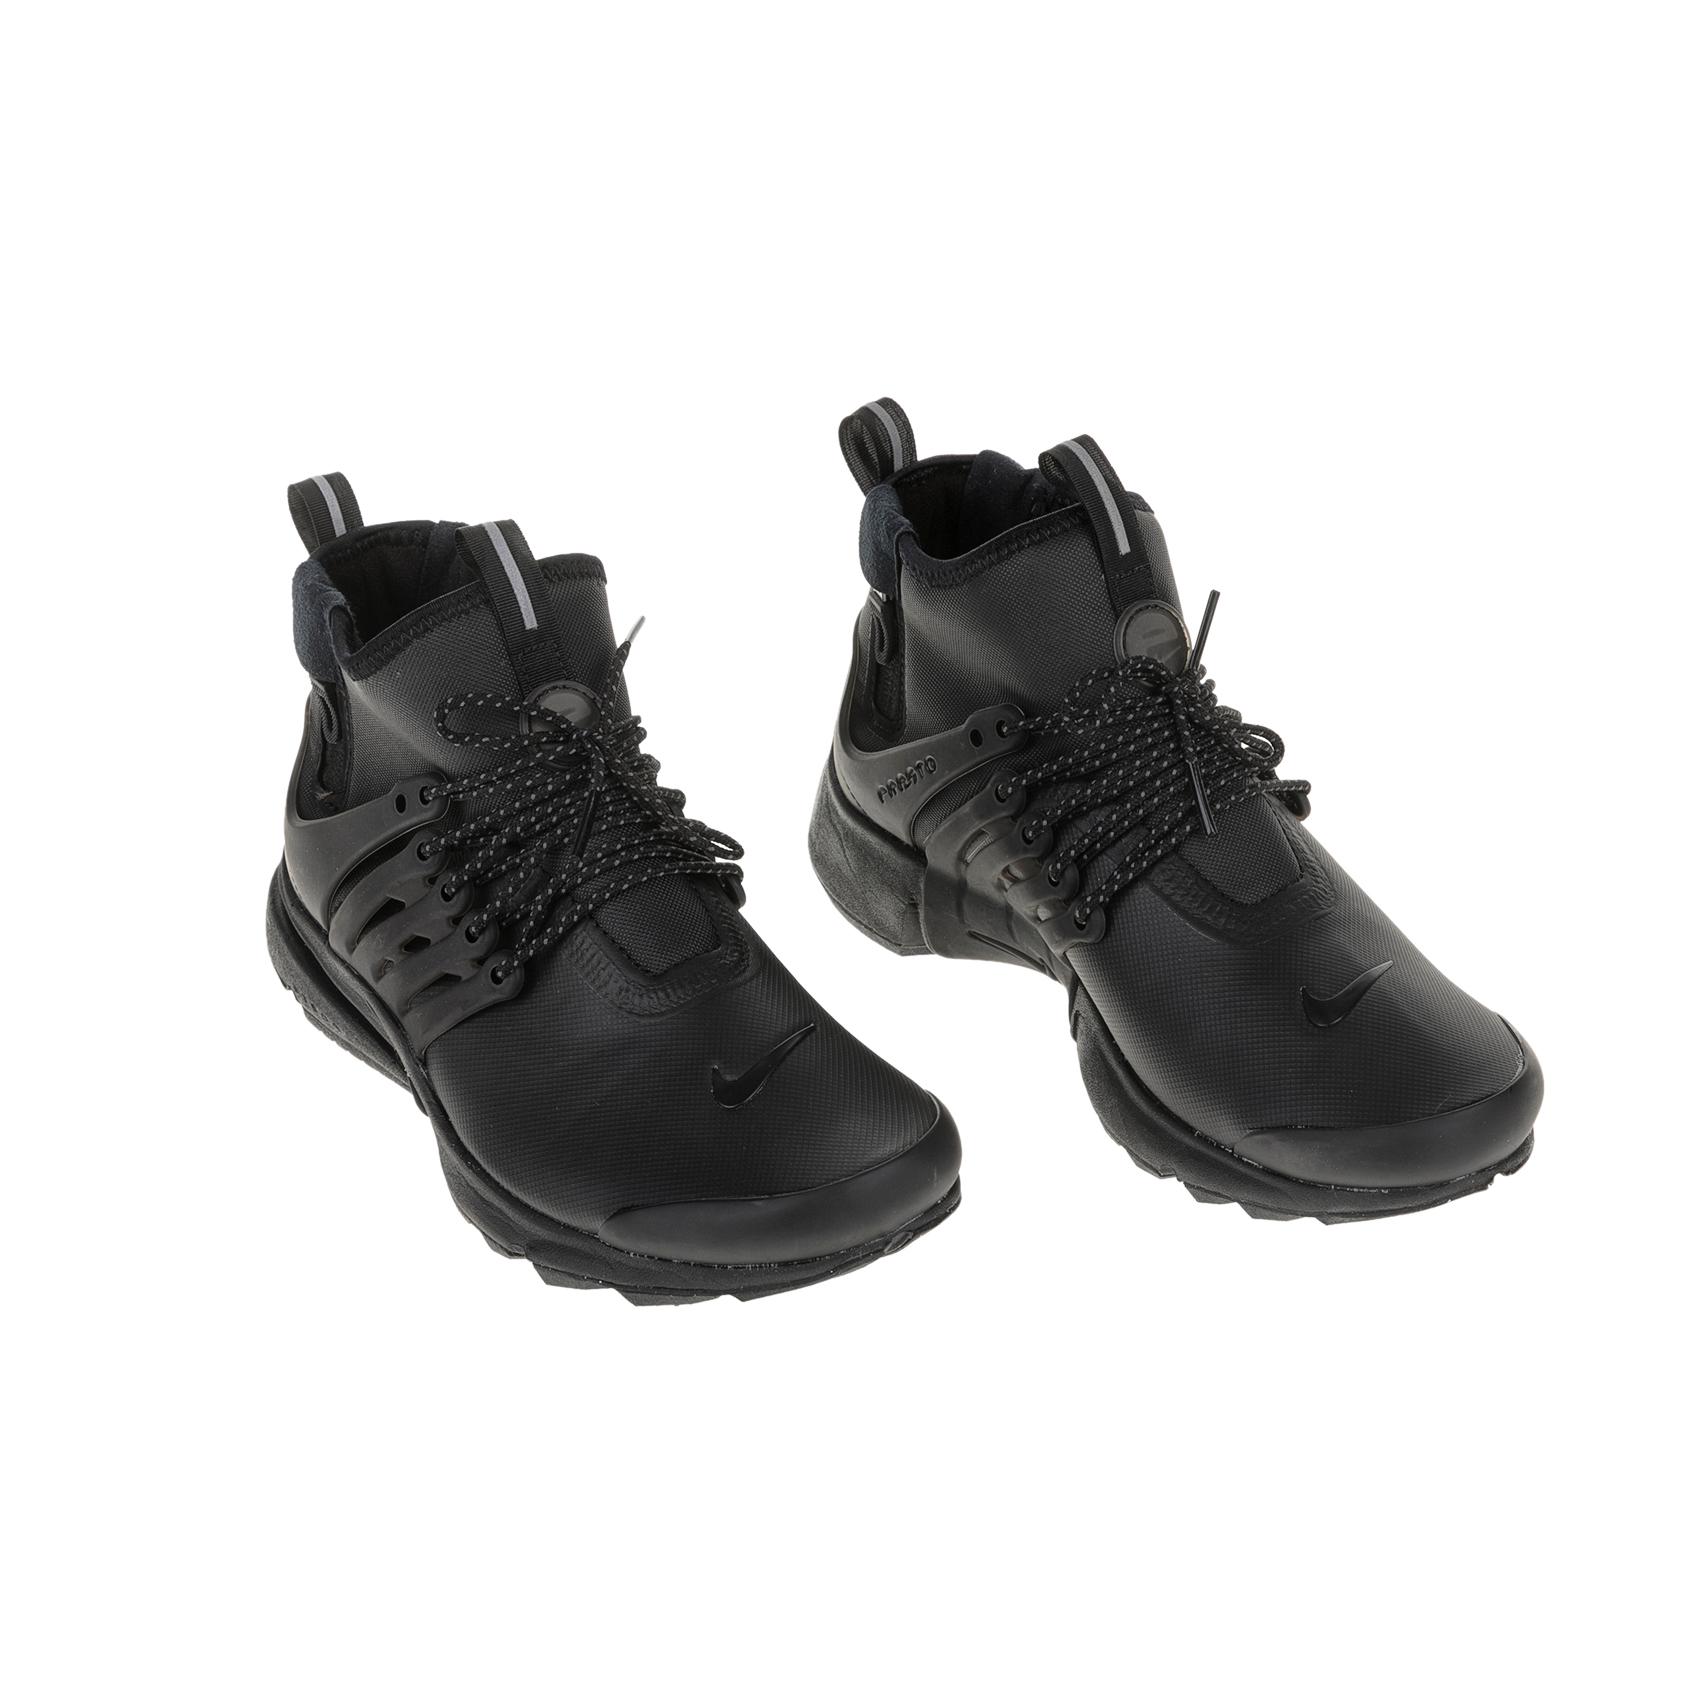 f18ccb736ec NIKE - Ανδρικά αθλητικά παπούτσια AIR PRESTO MID UTILITY μαύρα ...